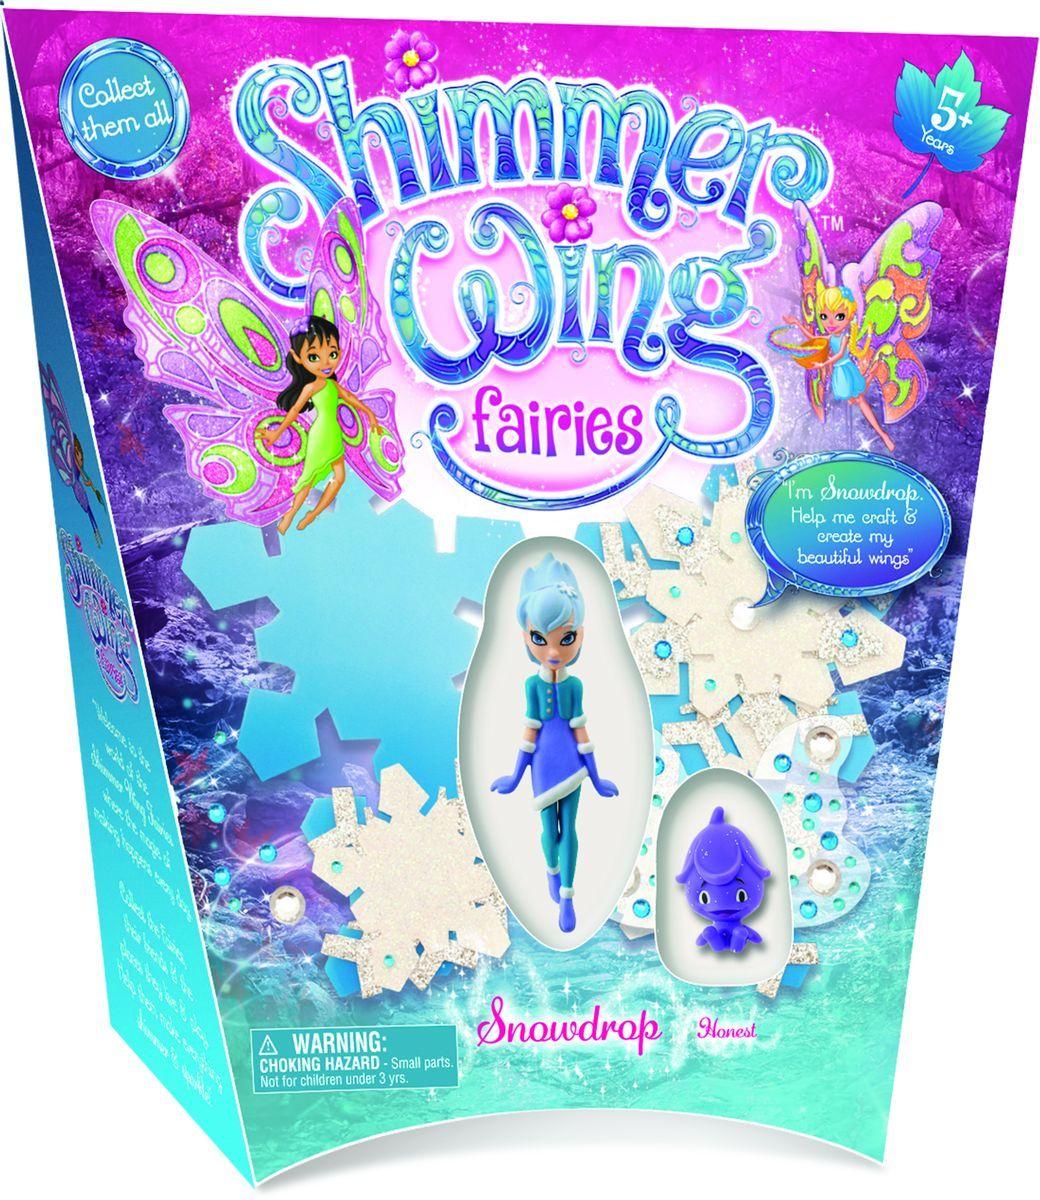 Shimmer WingИгровой набор с мини-куклой Фея Снежинка Ultimate Source Ltd.